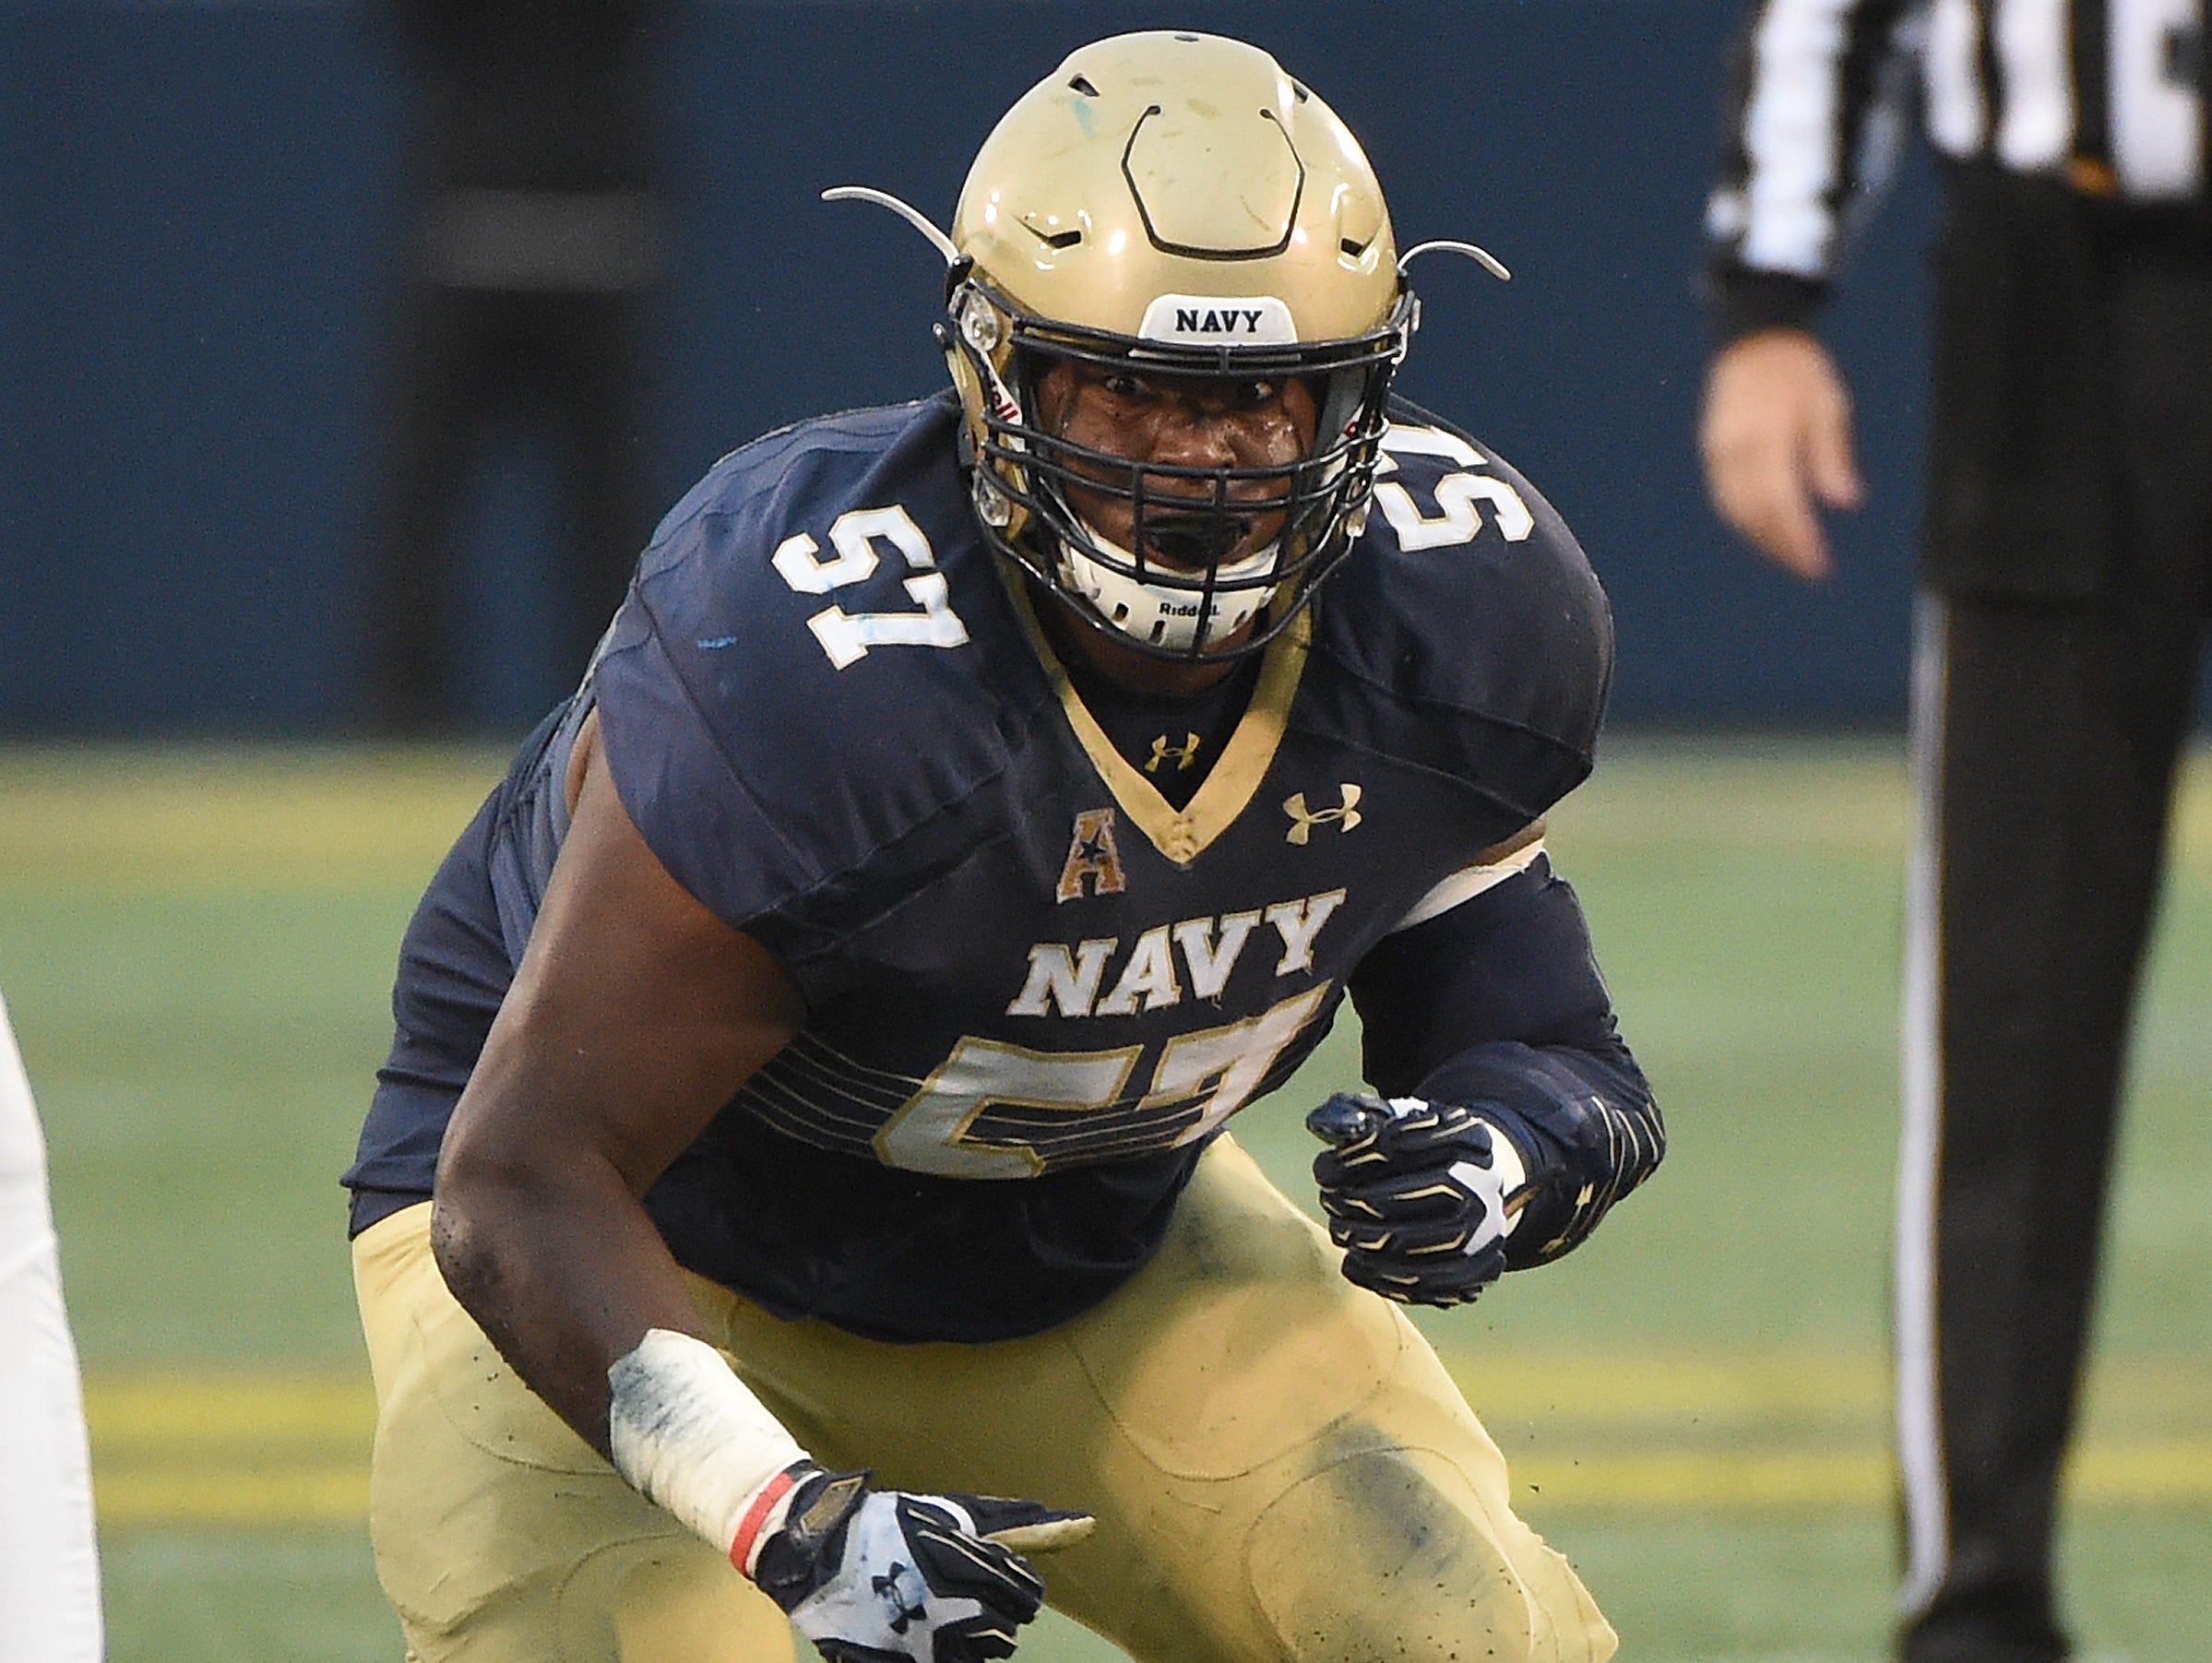 Navy senior offensive lineman E.K. Binns has been a key player for the Midshipmen.